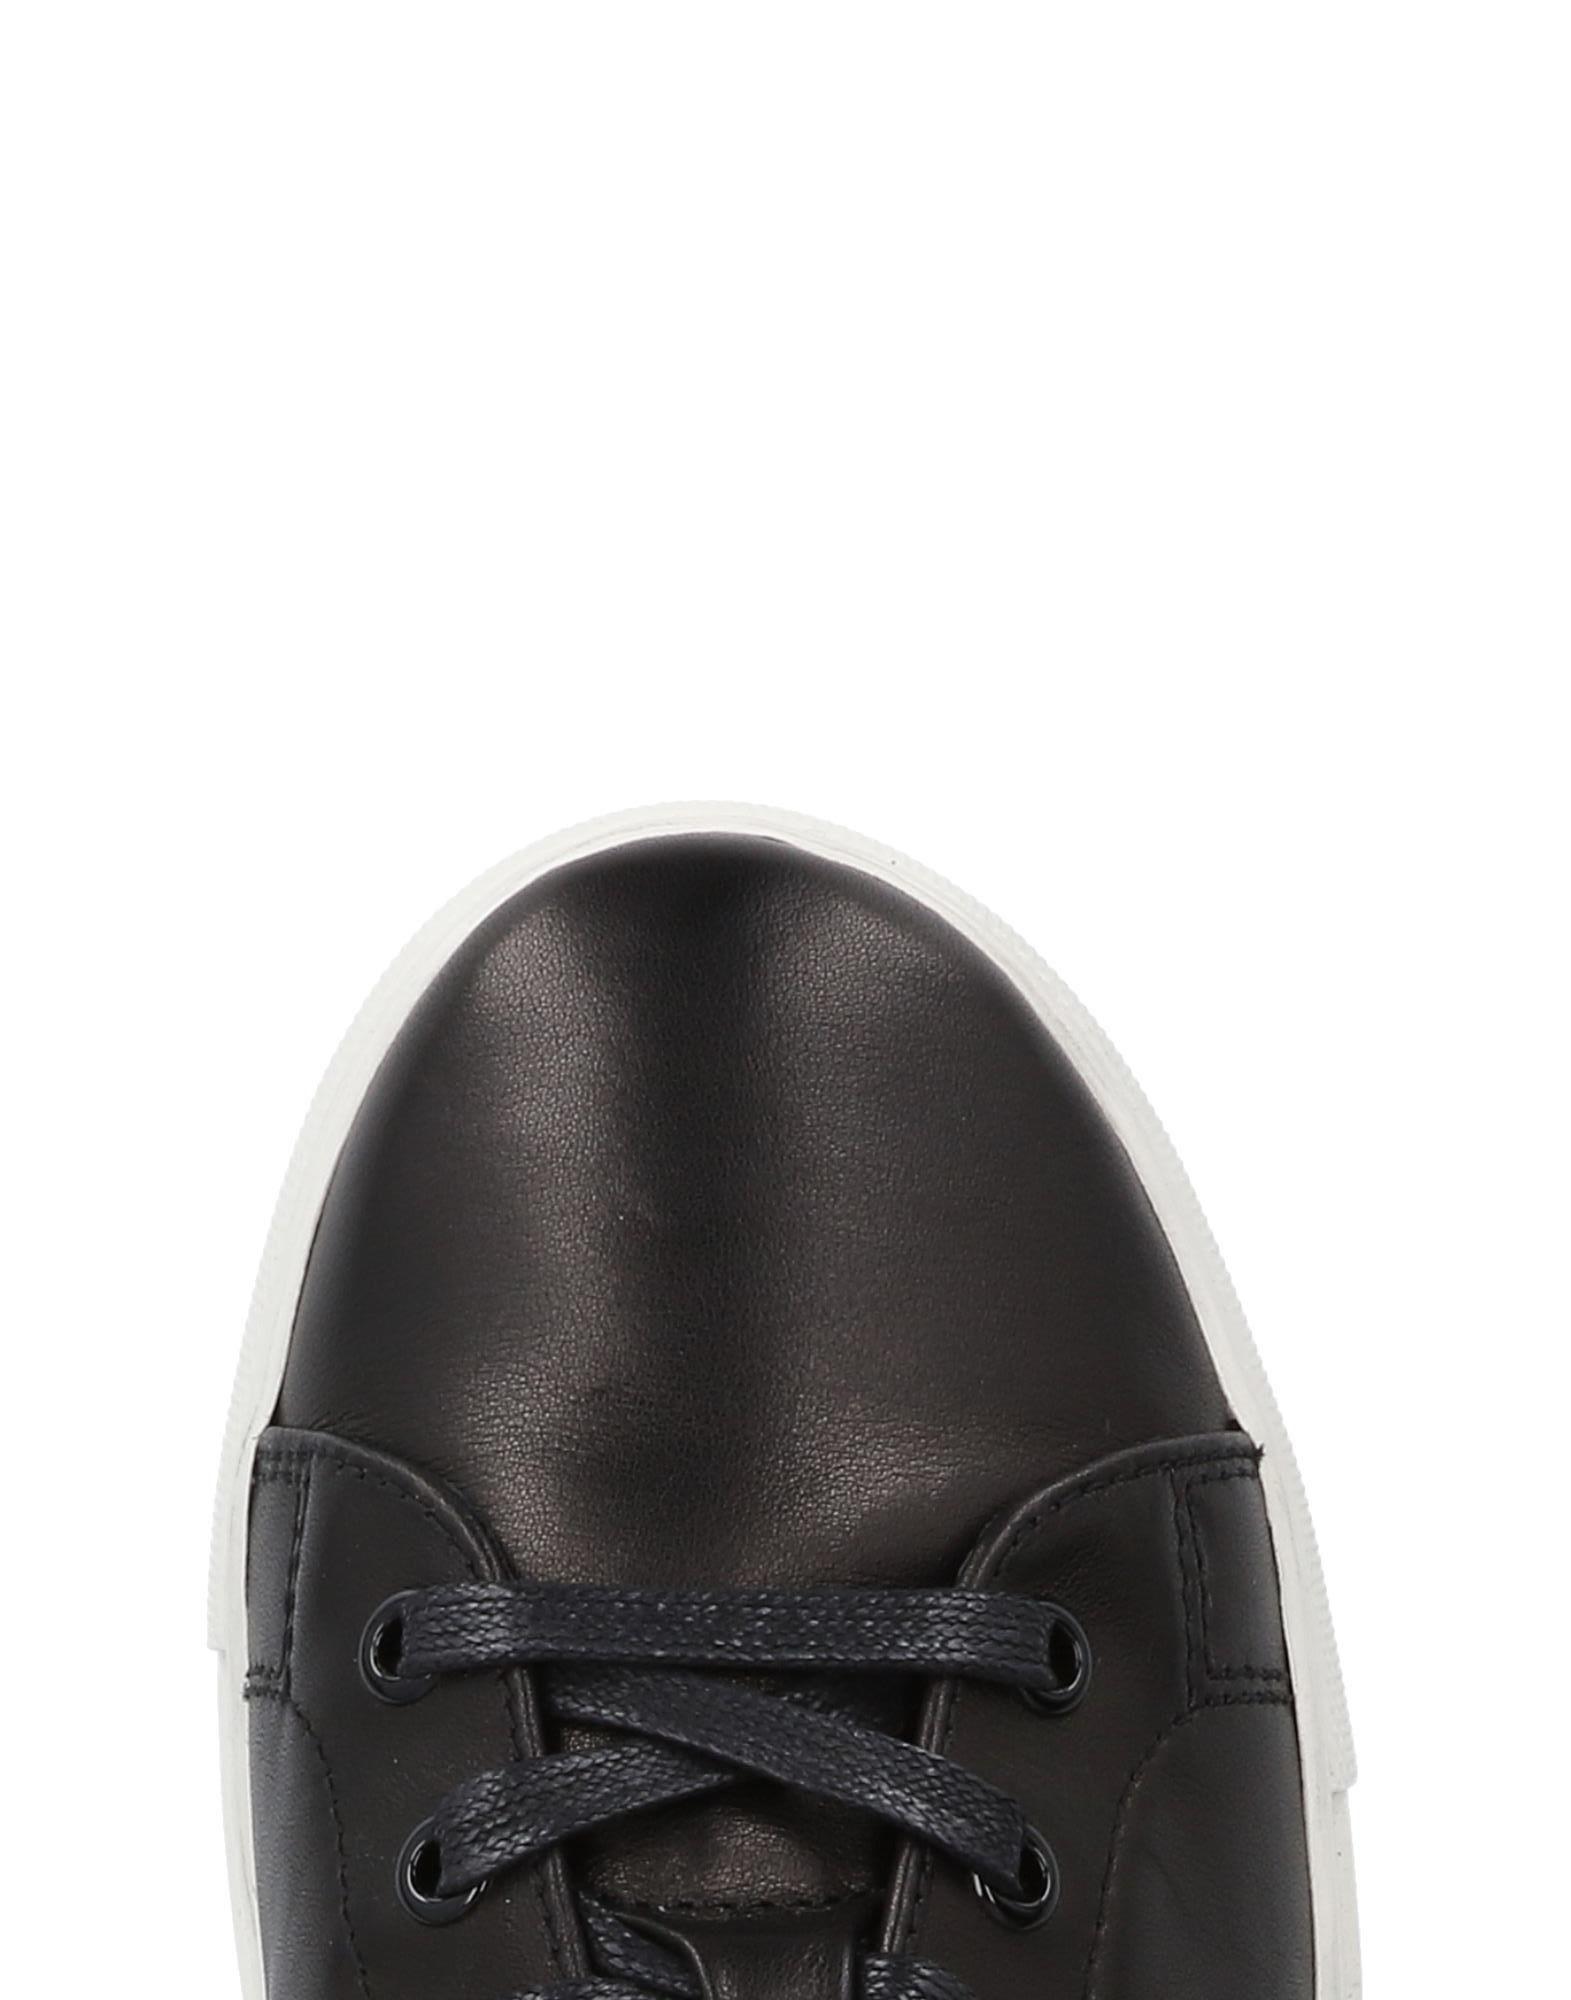 Gut um billige Turnschuhes Schuhe zu tragenLola Cruz Turnschuhes billige Damen 11255191QU ed681d